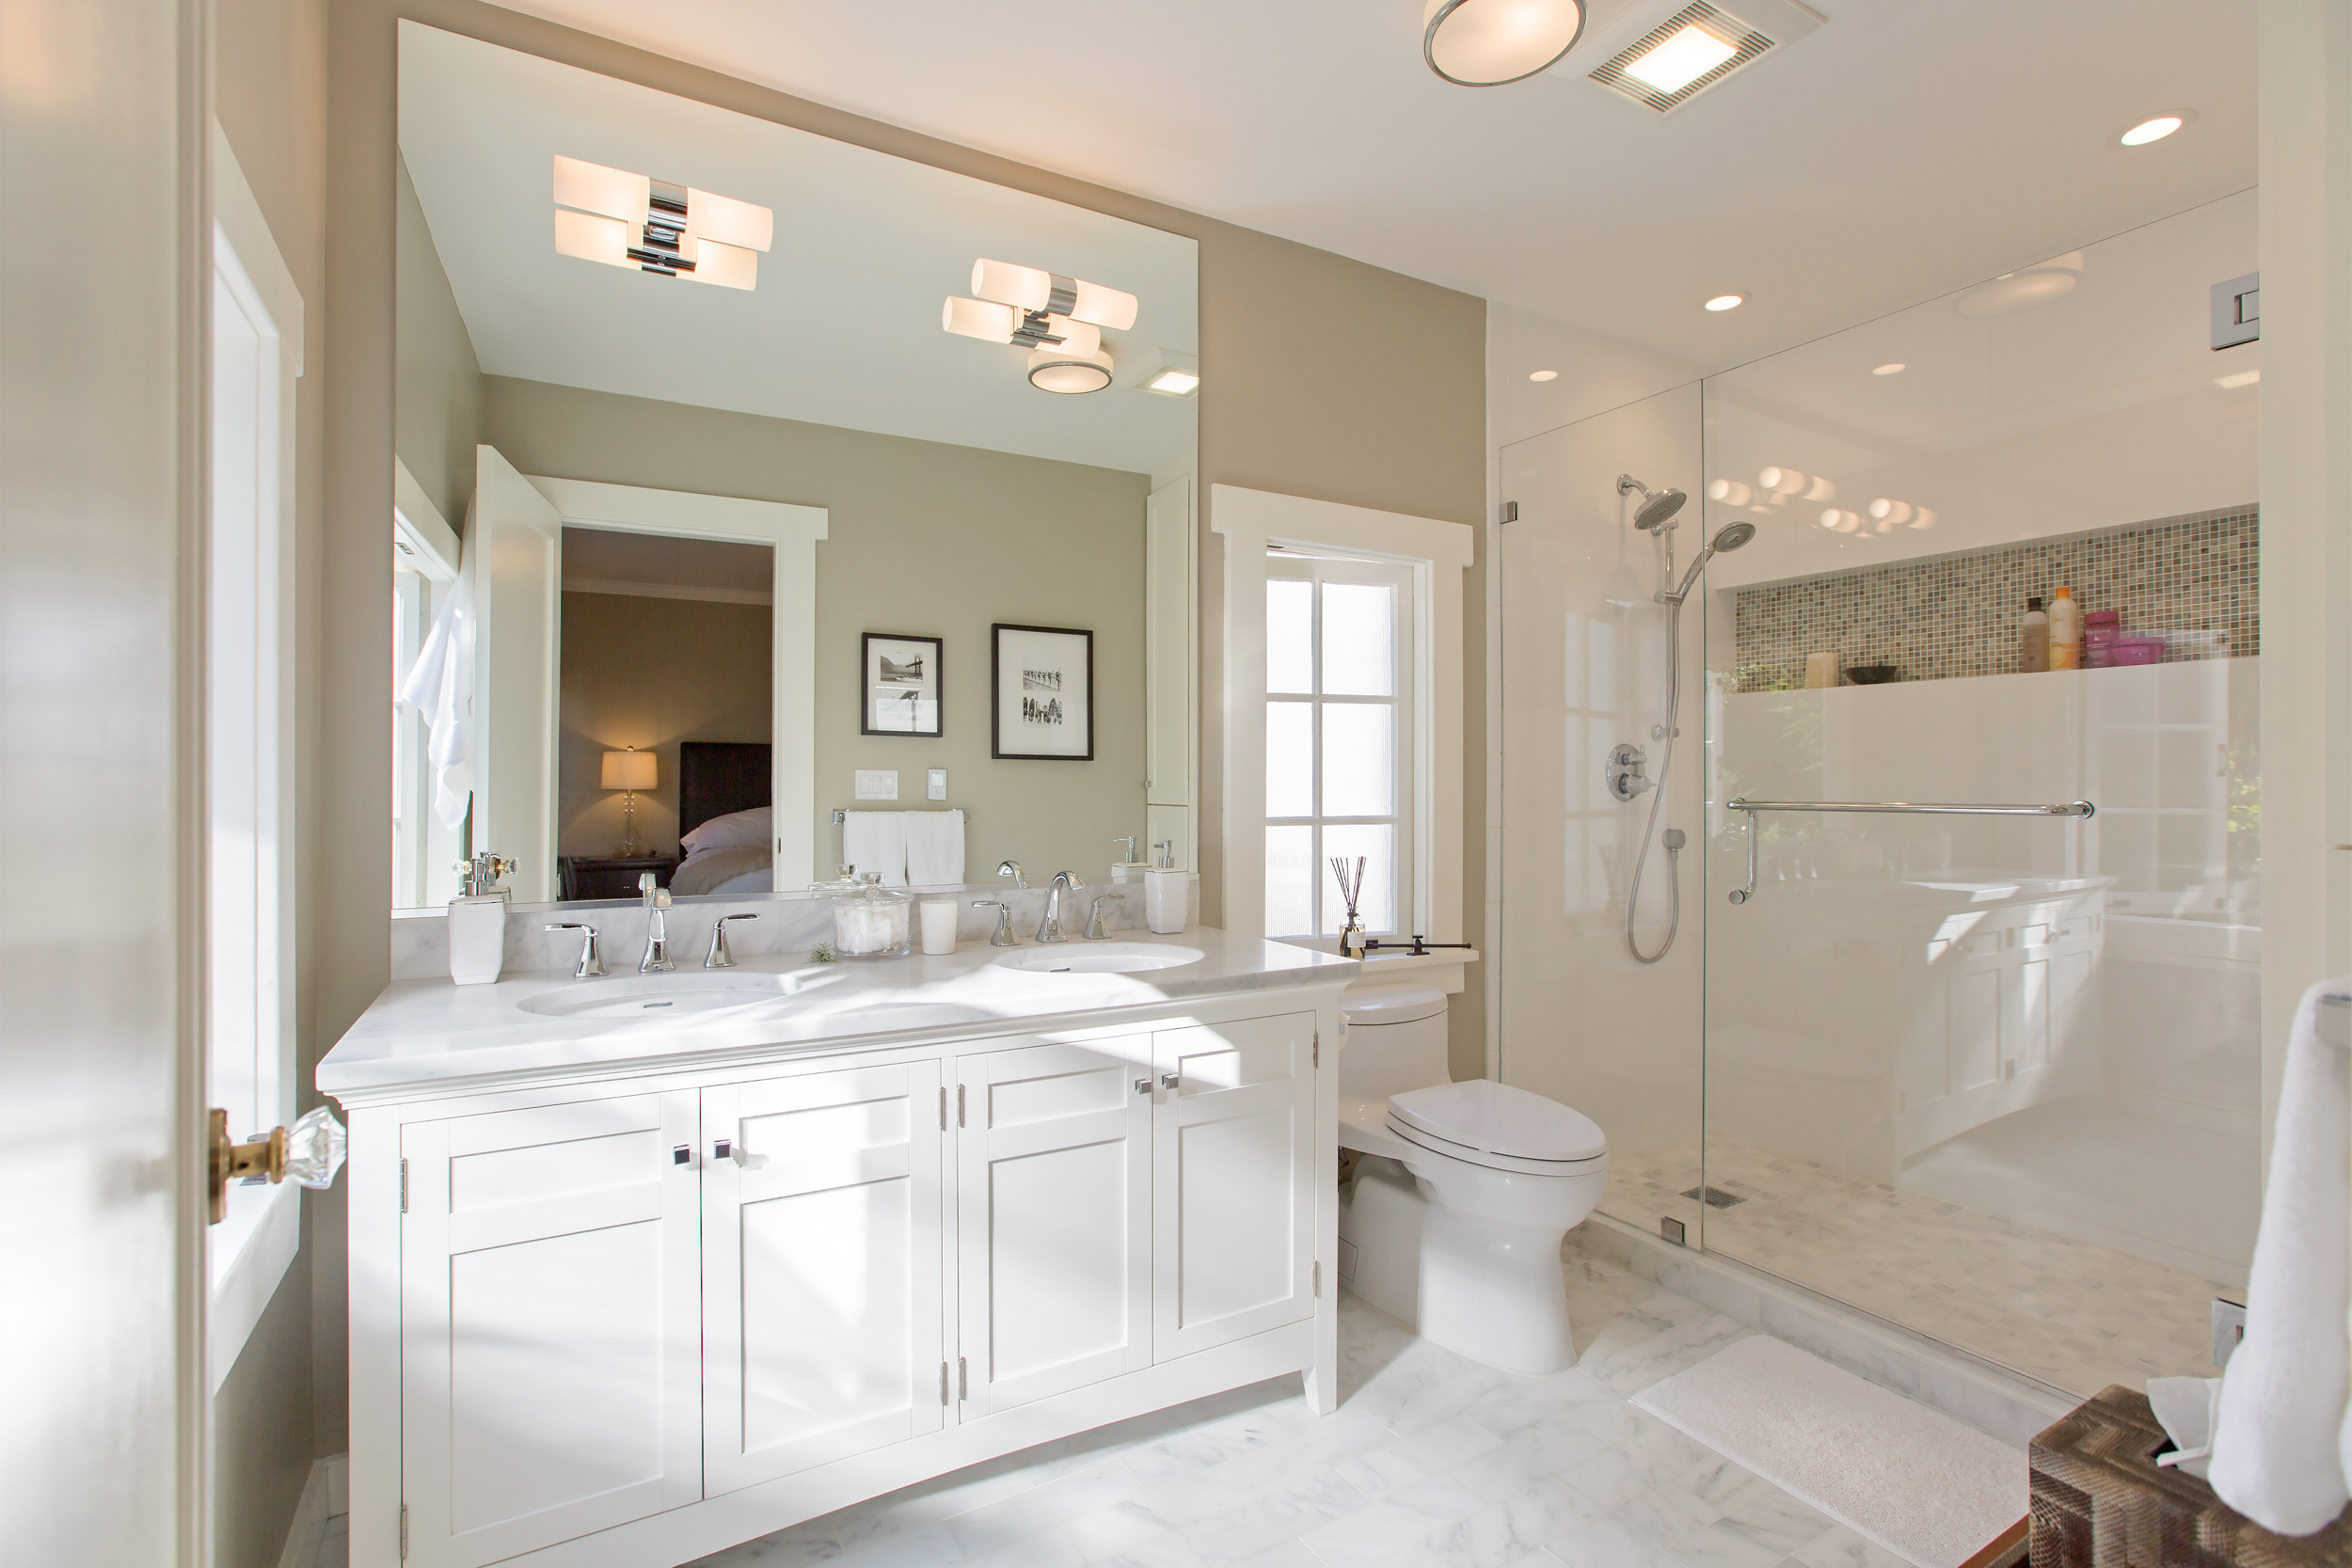 william-adams-design-cole-valley-white-bathroom-double-marble-vanity-walk-in-shower-1.jpg